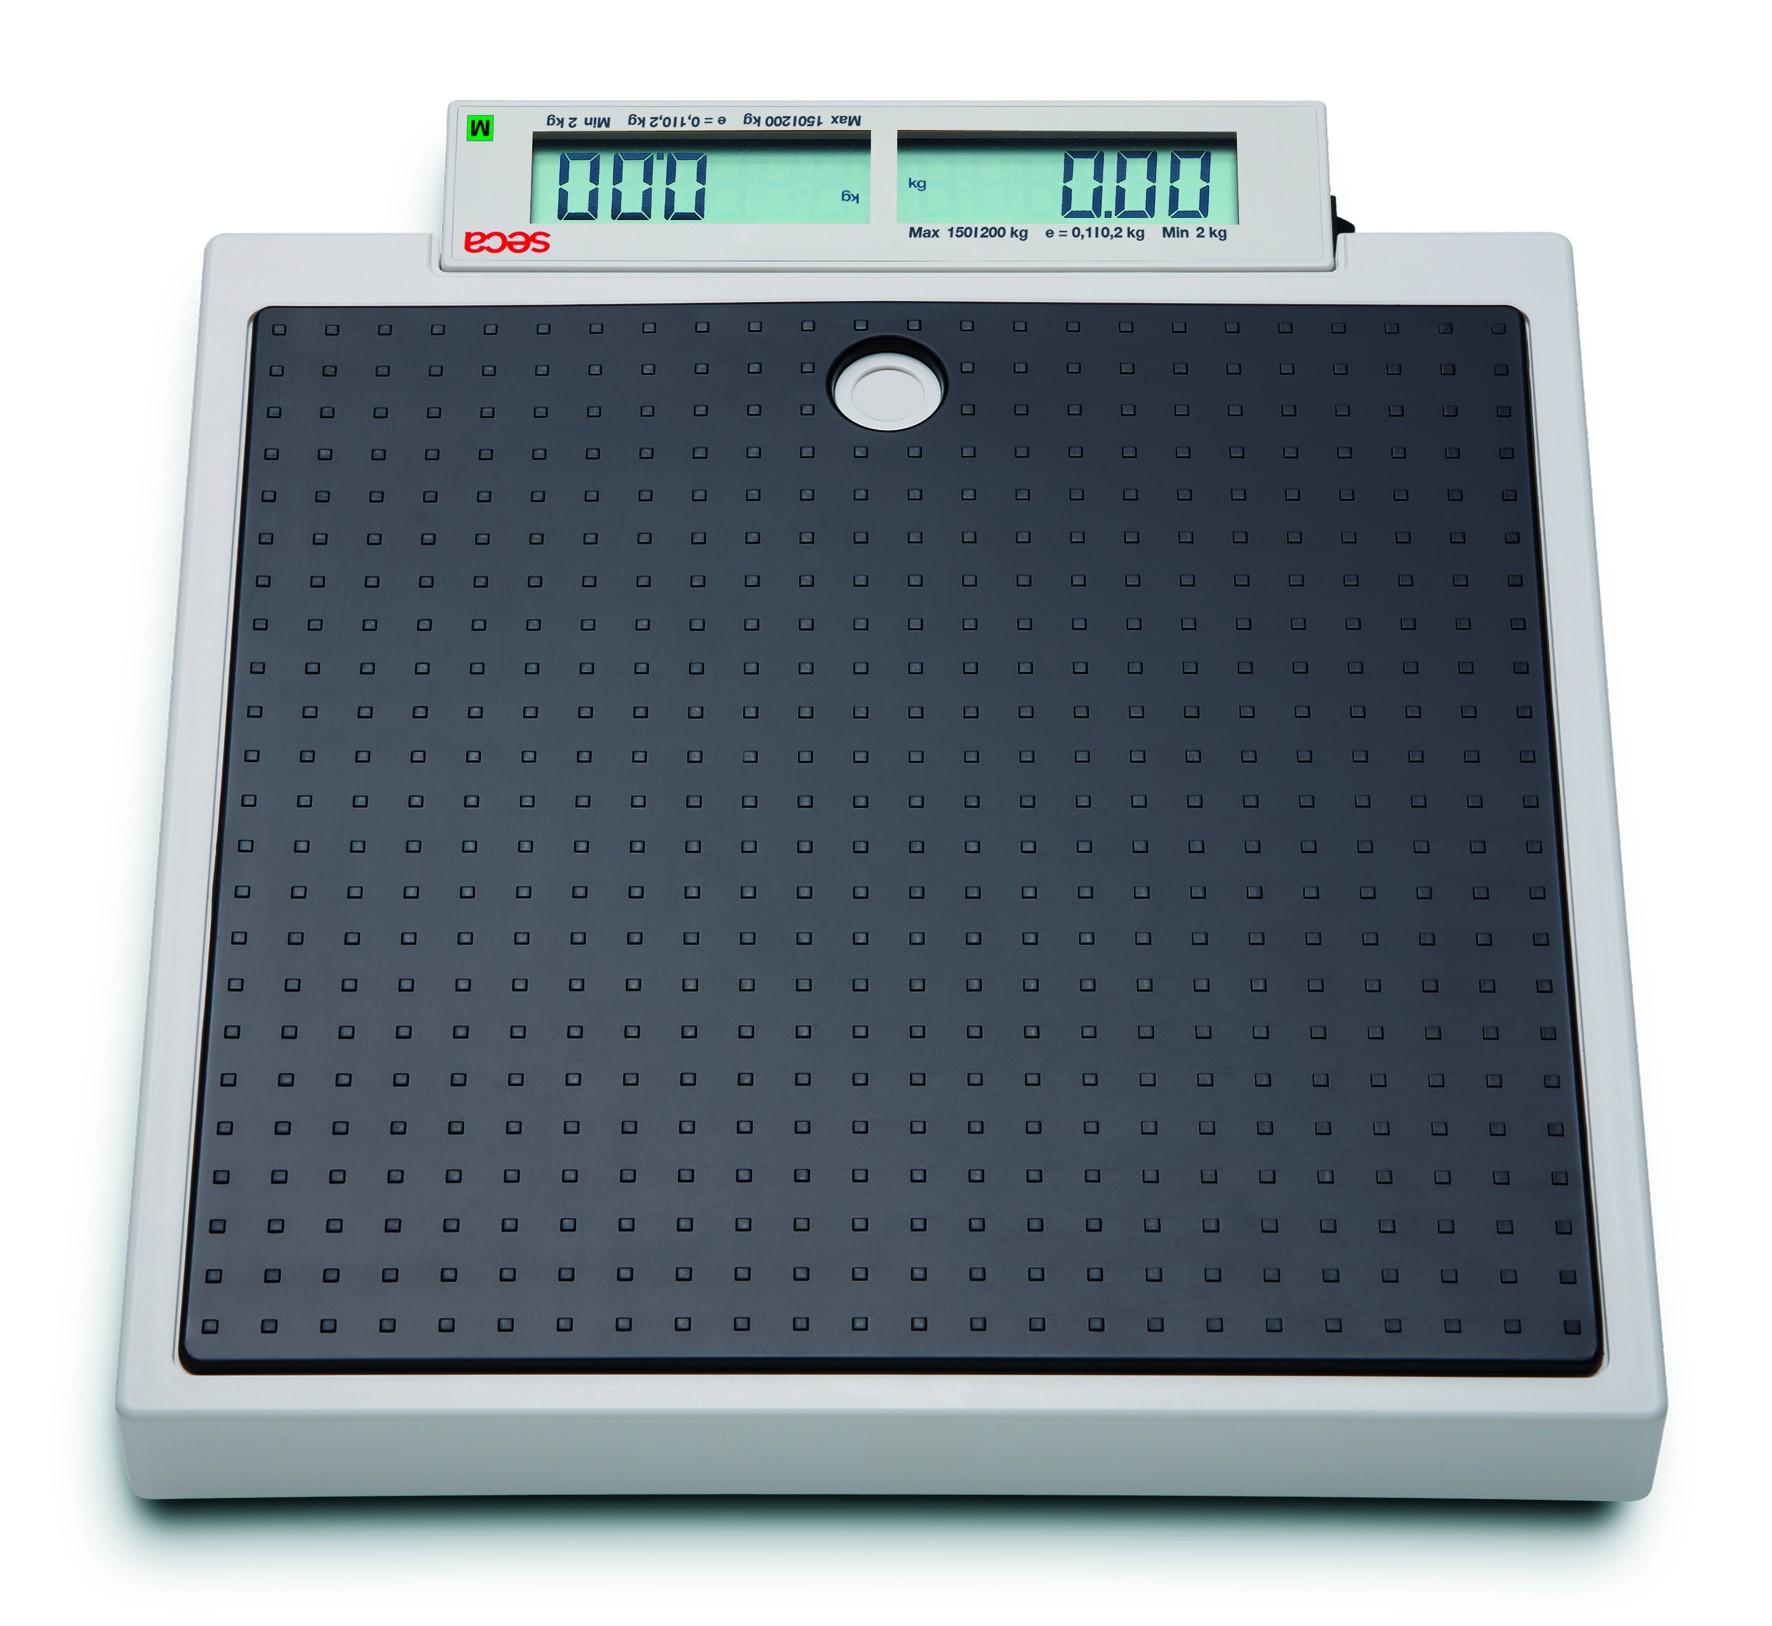 Seca 878 Class Iii Digital Flat Scale For Mobile Use